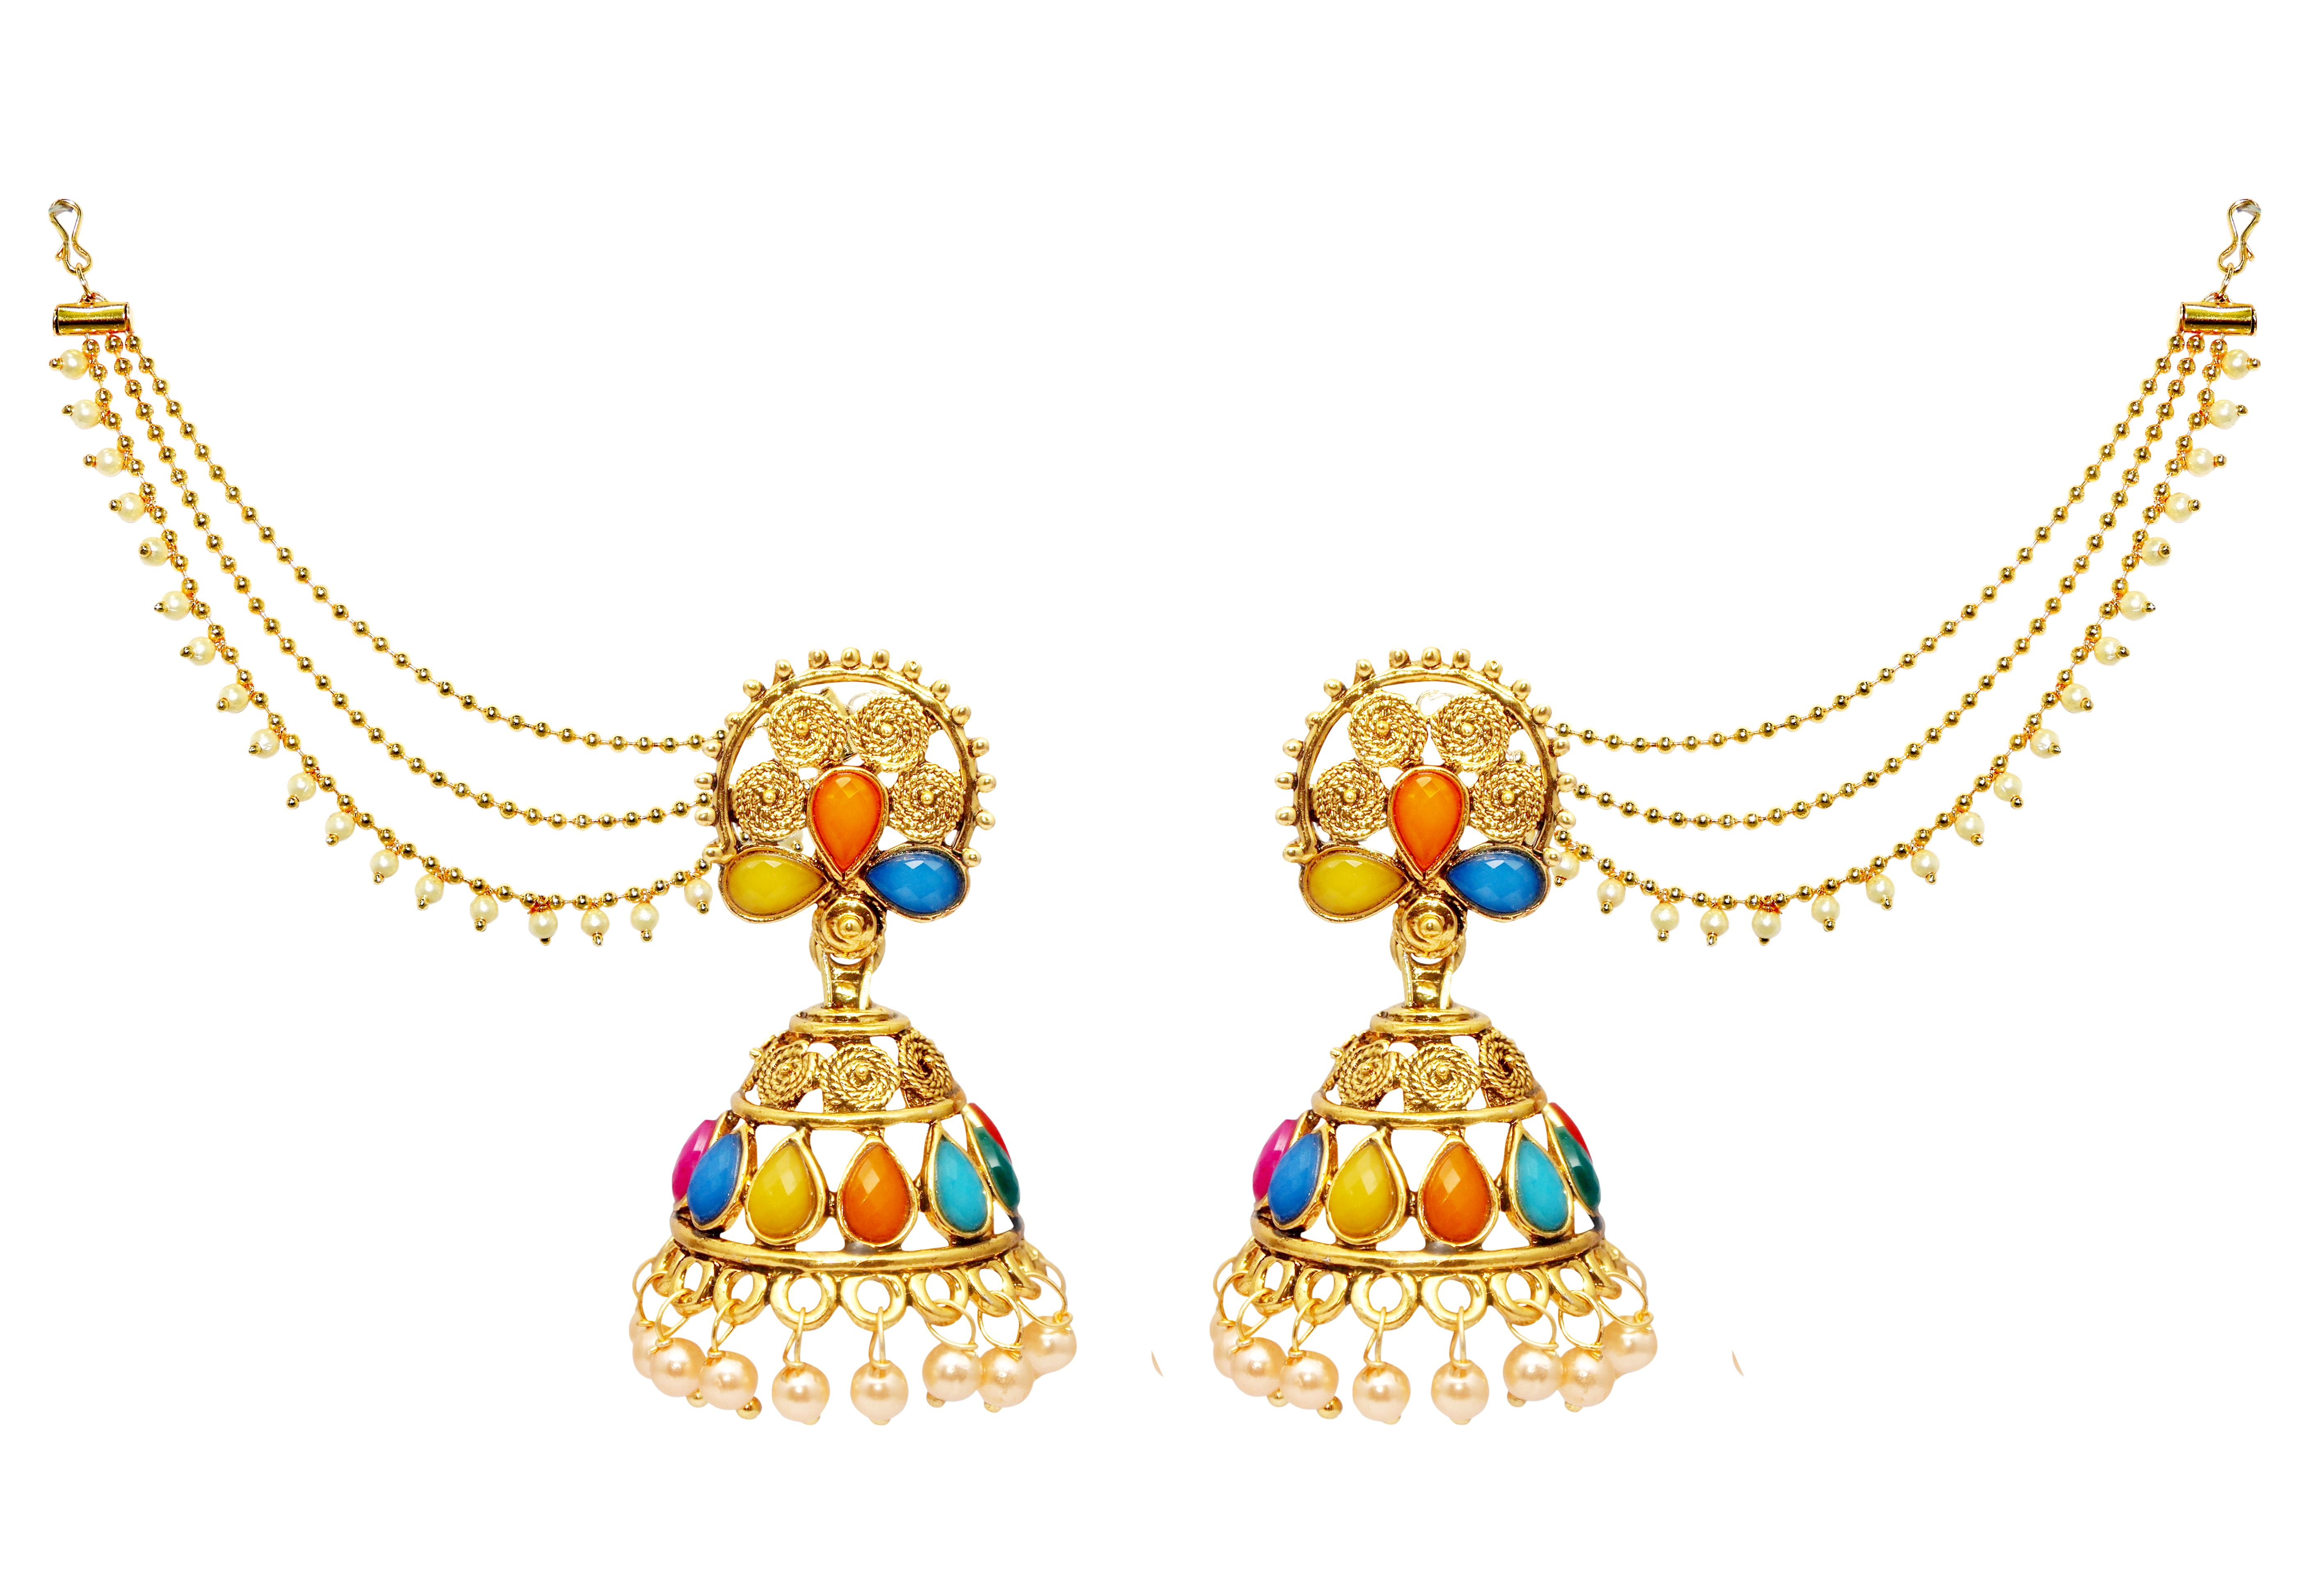 6173a7bfee6 Kriaa Gold Plated Multicolor Kundan Jhumki Kan Chain Earrings   Rs.299 -